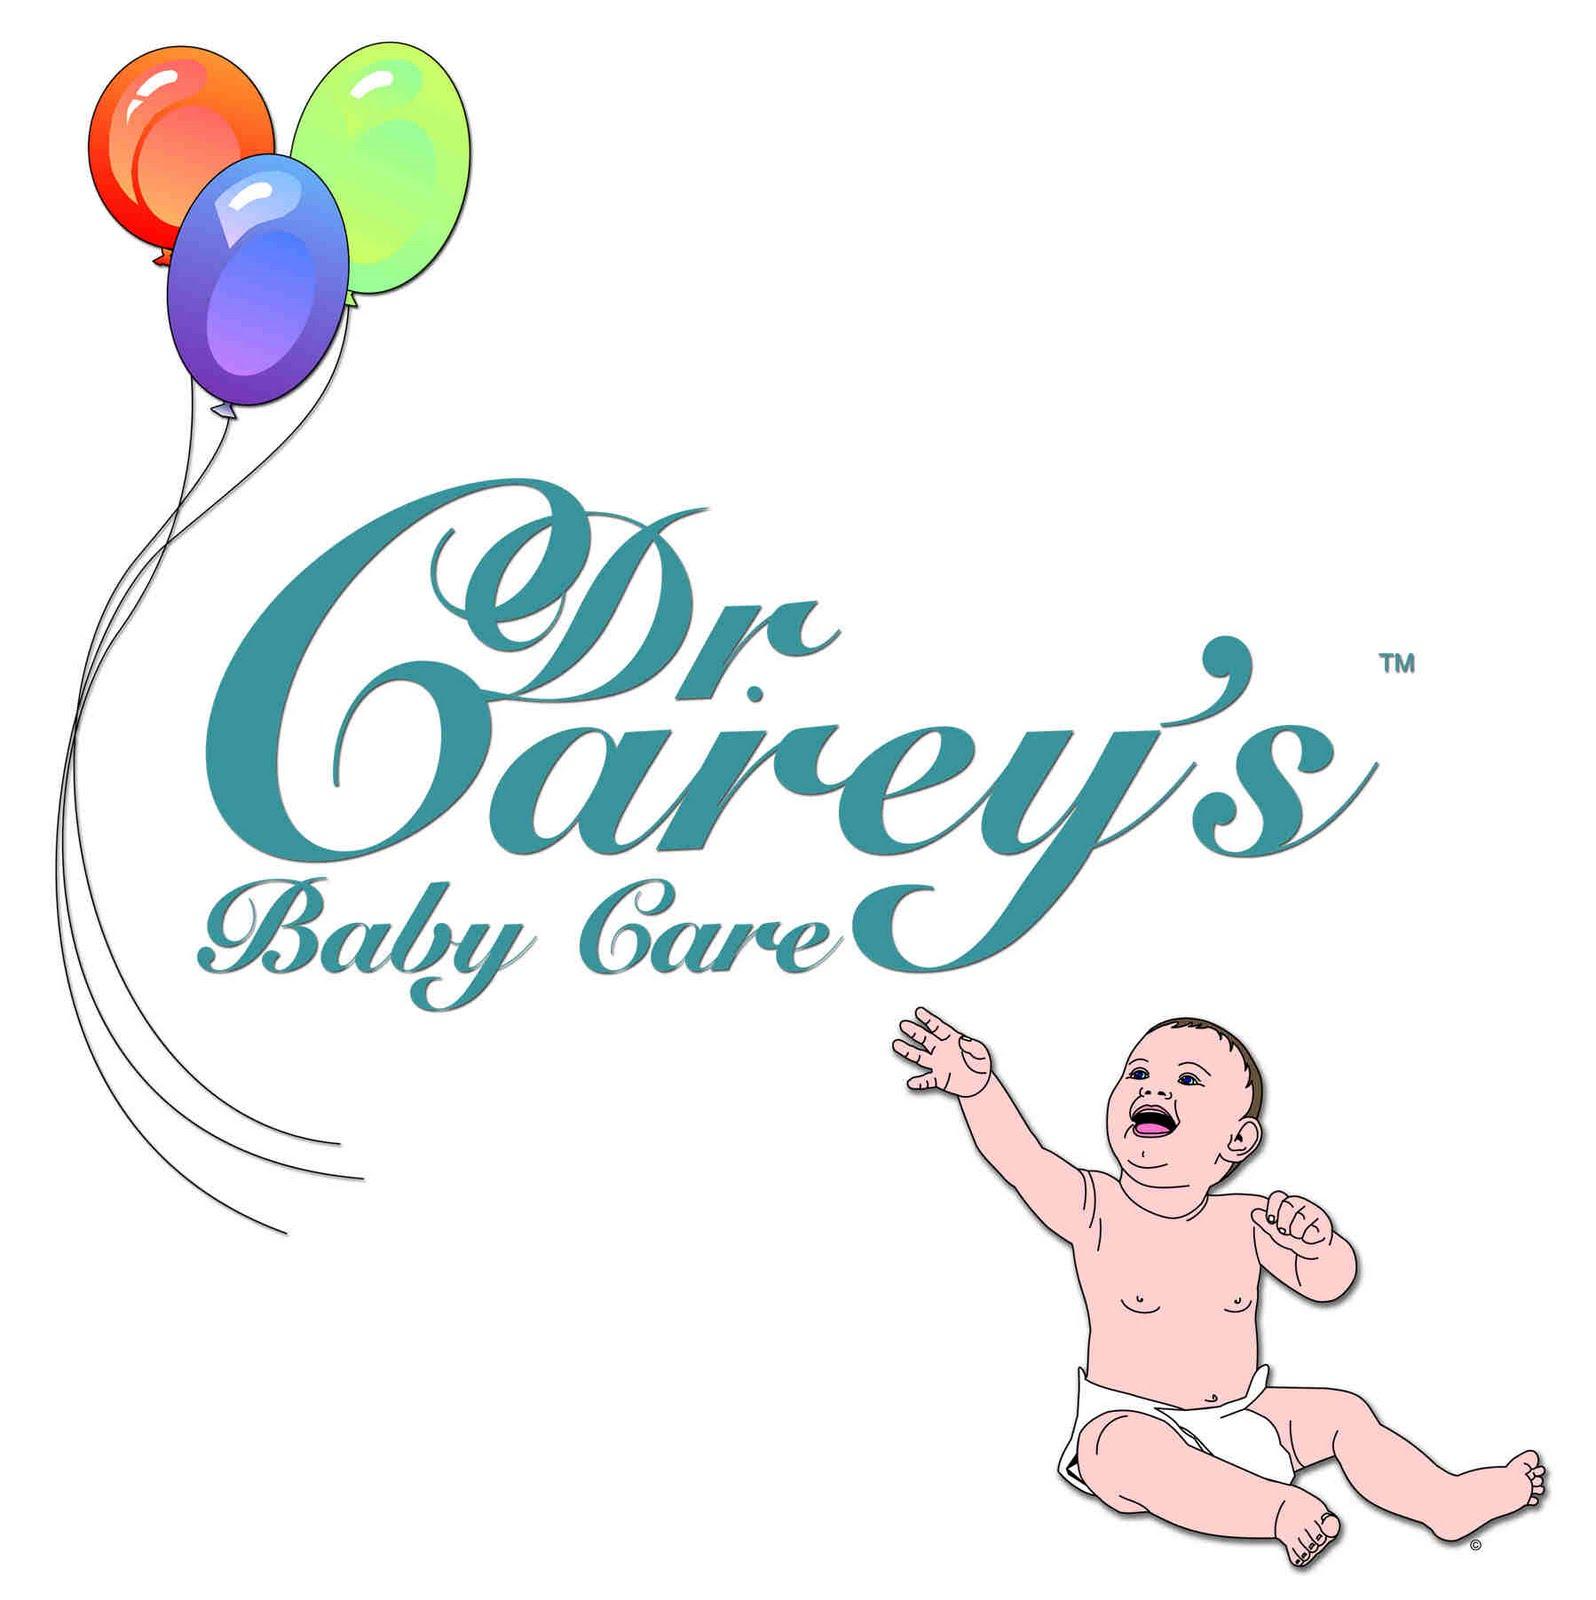 [Dr_Careys_Baby_Care_logo_125x125pixels.jpg]